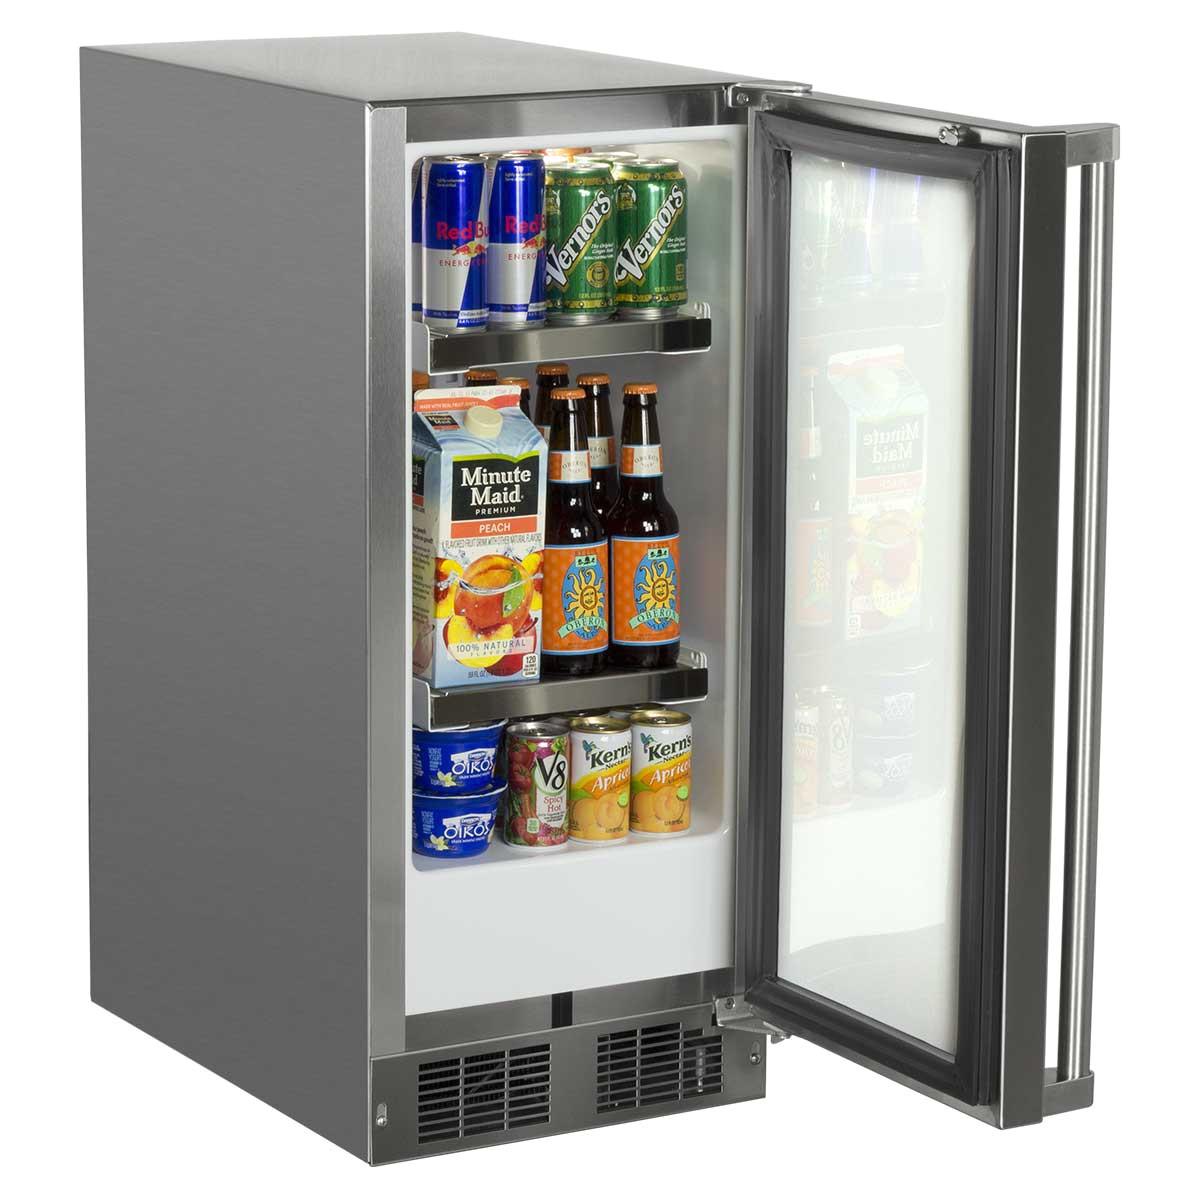 18 Shallow Depth Undercounter Refrigerator Undercounter Refrigerators From Marvel Refrigeration